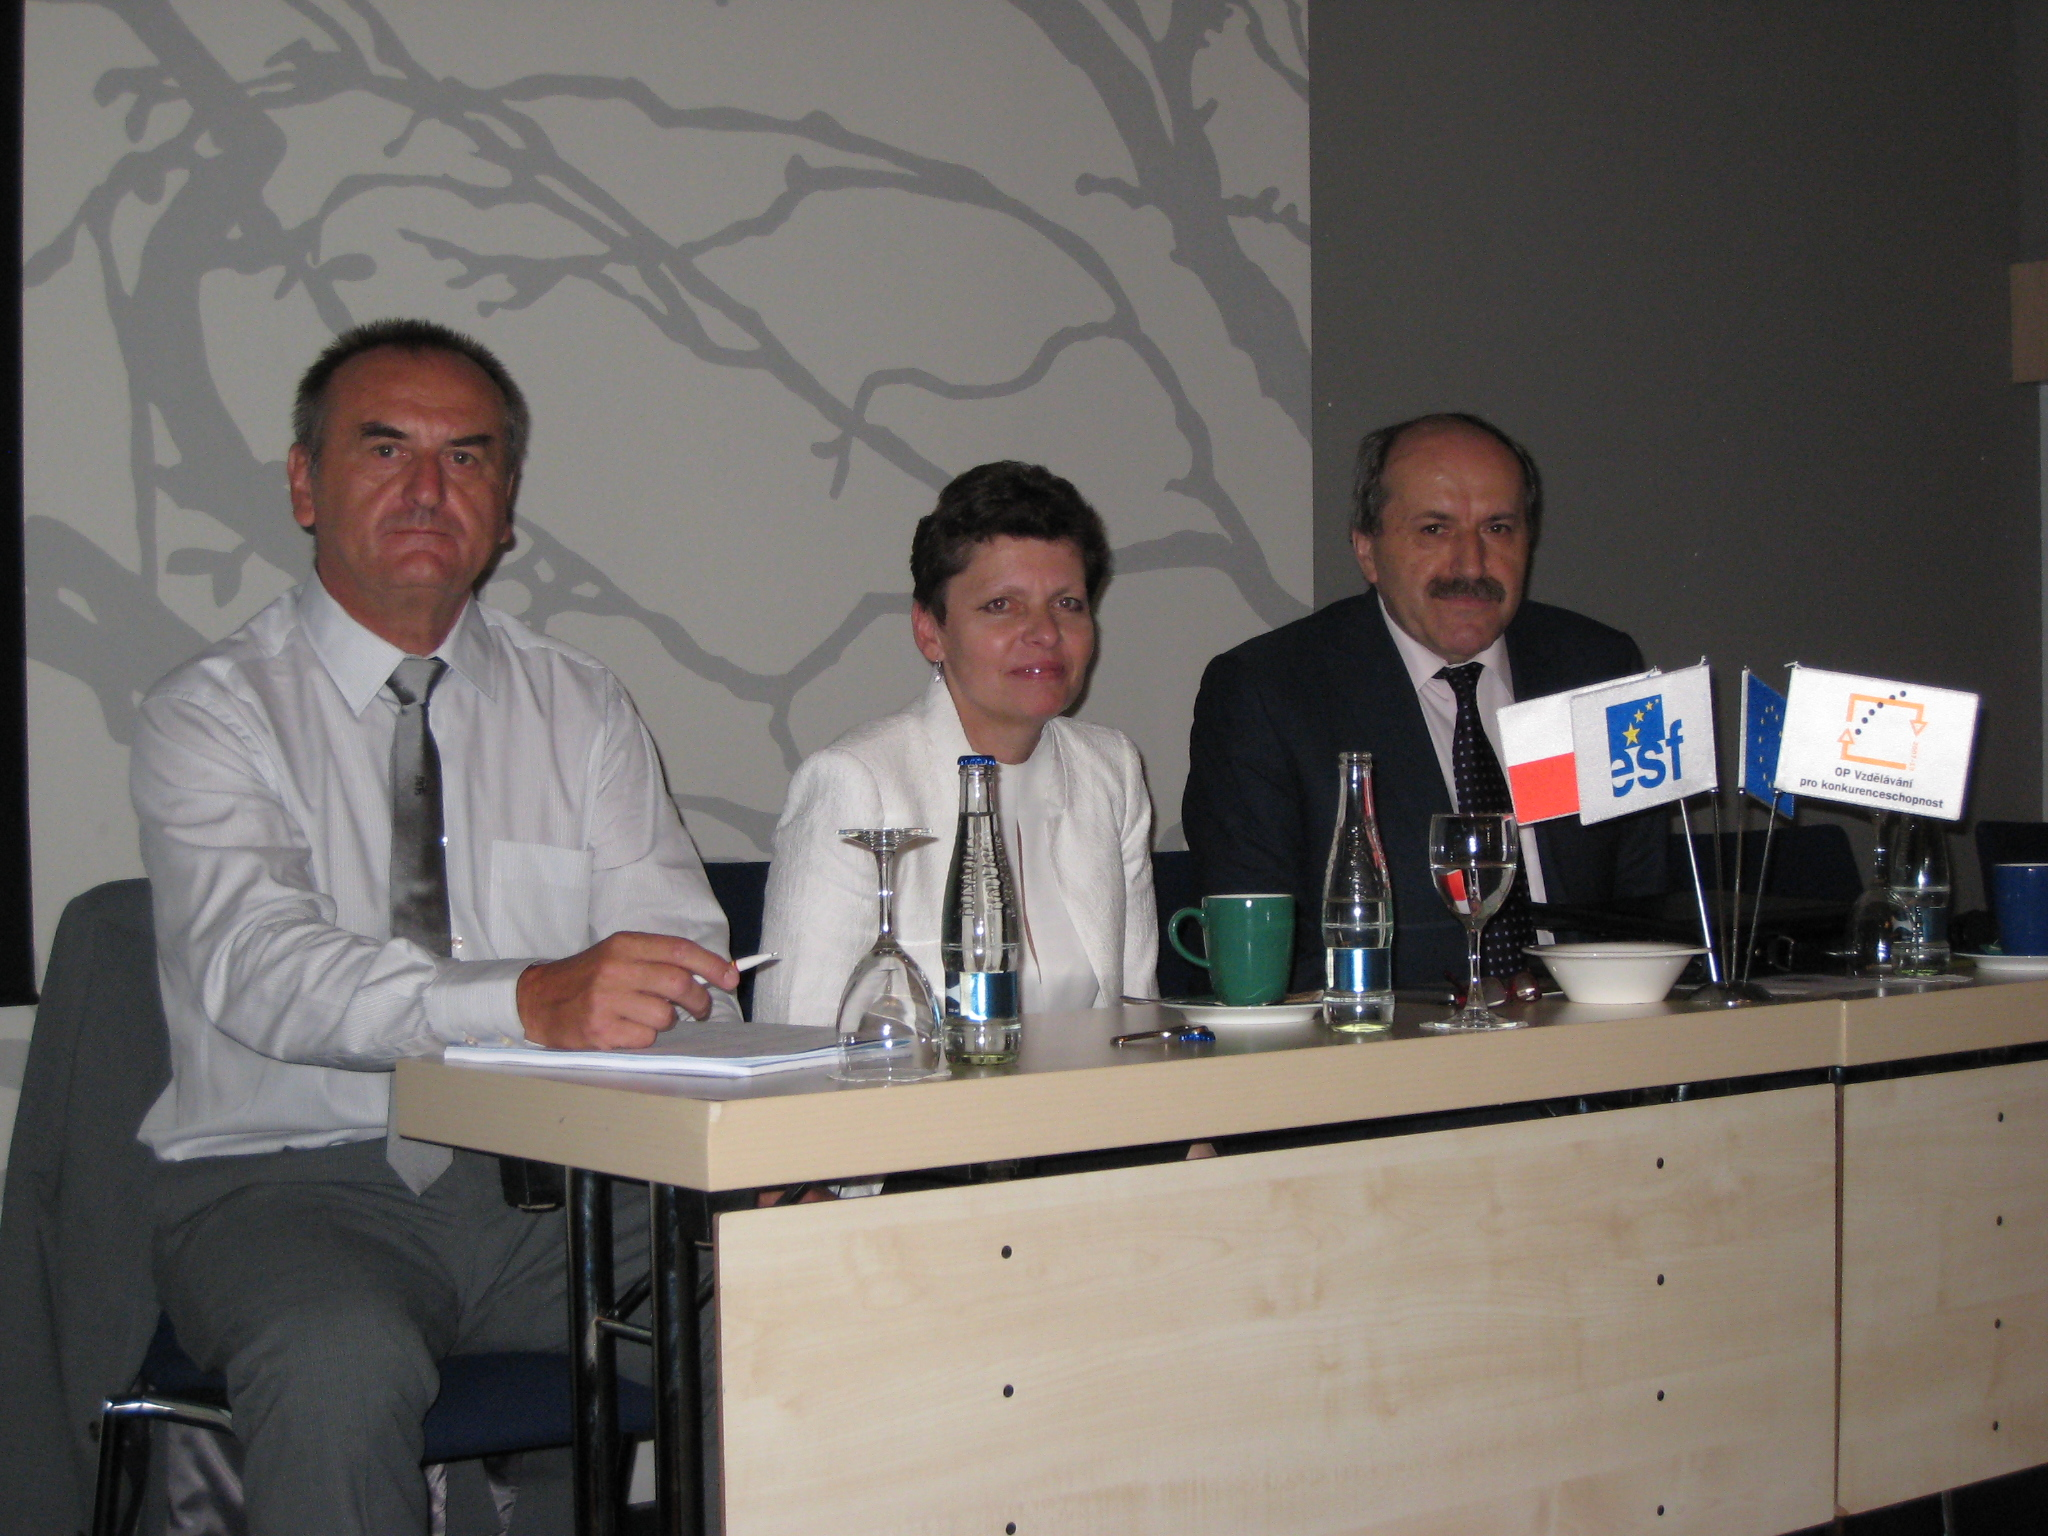 spinnet-ostrava-2012-011